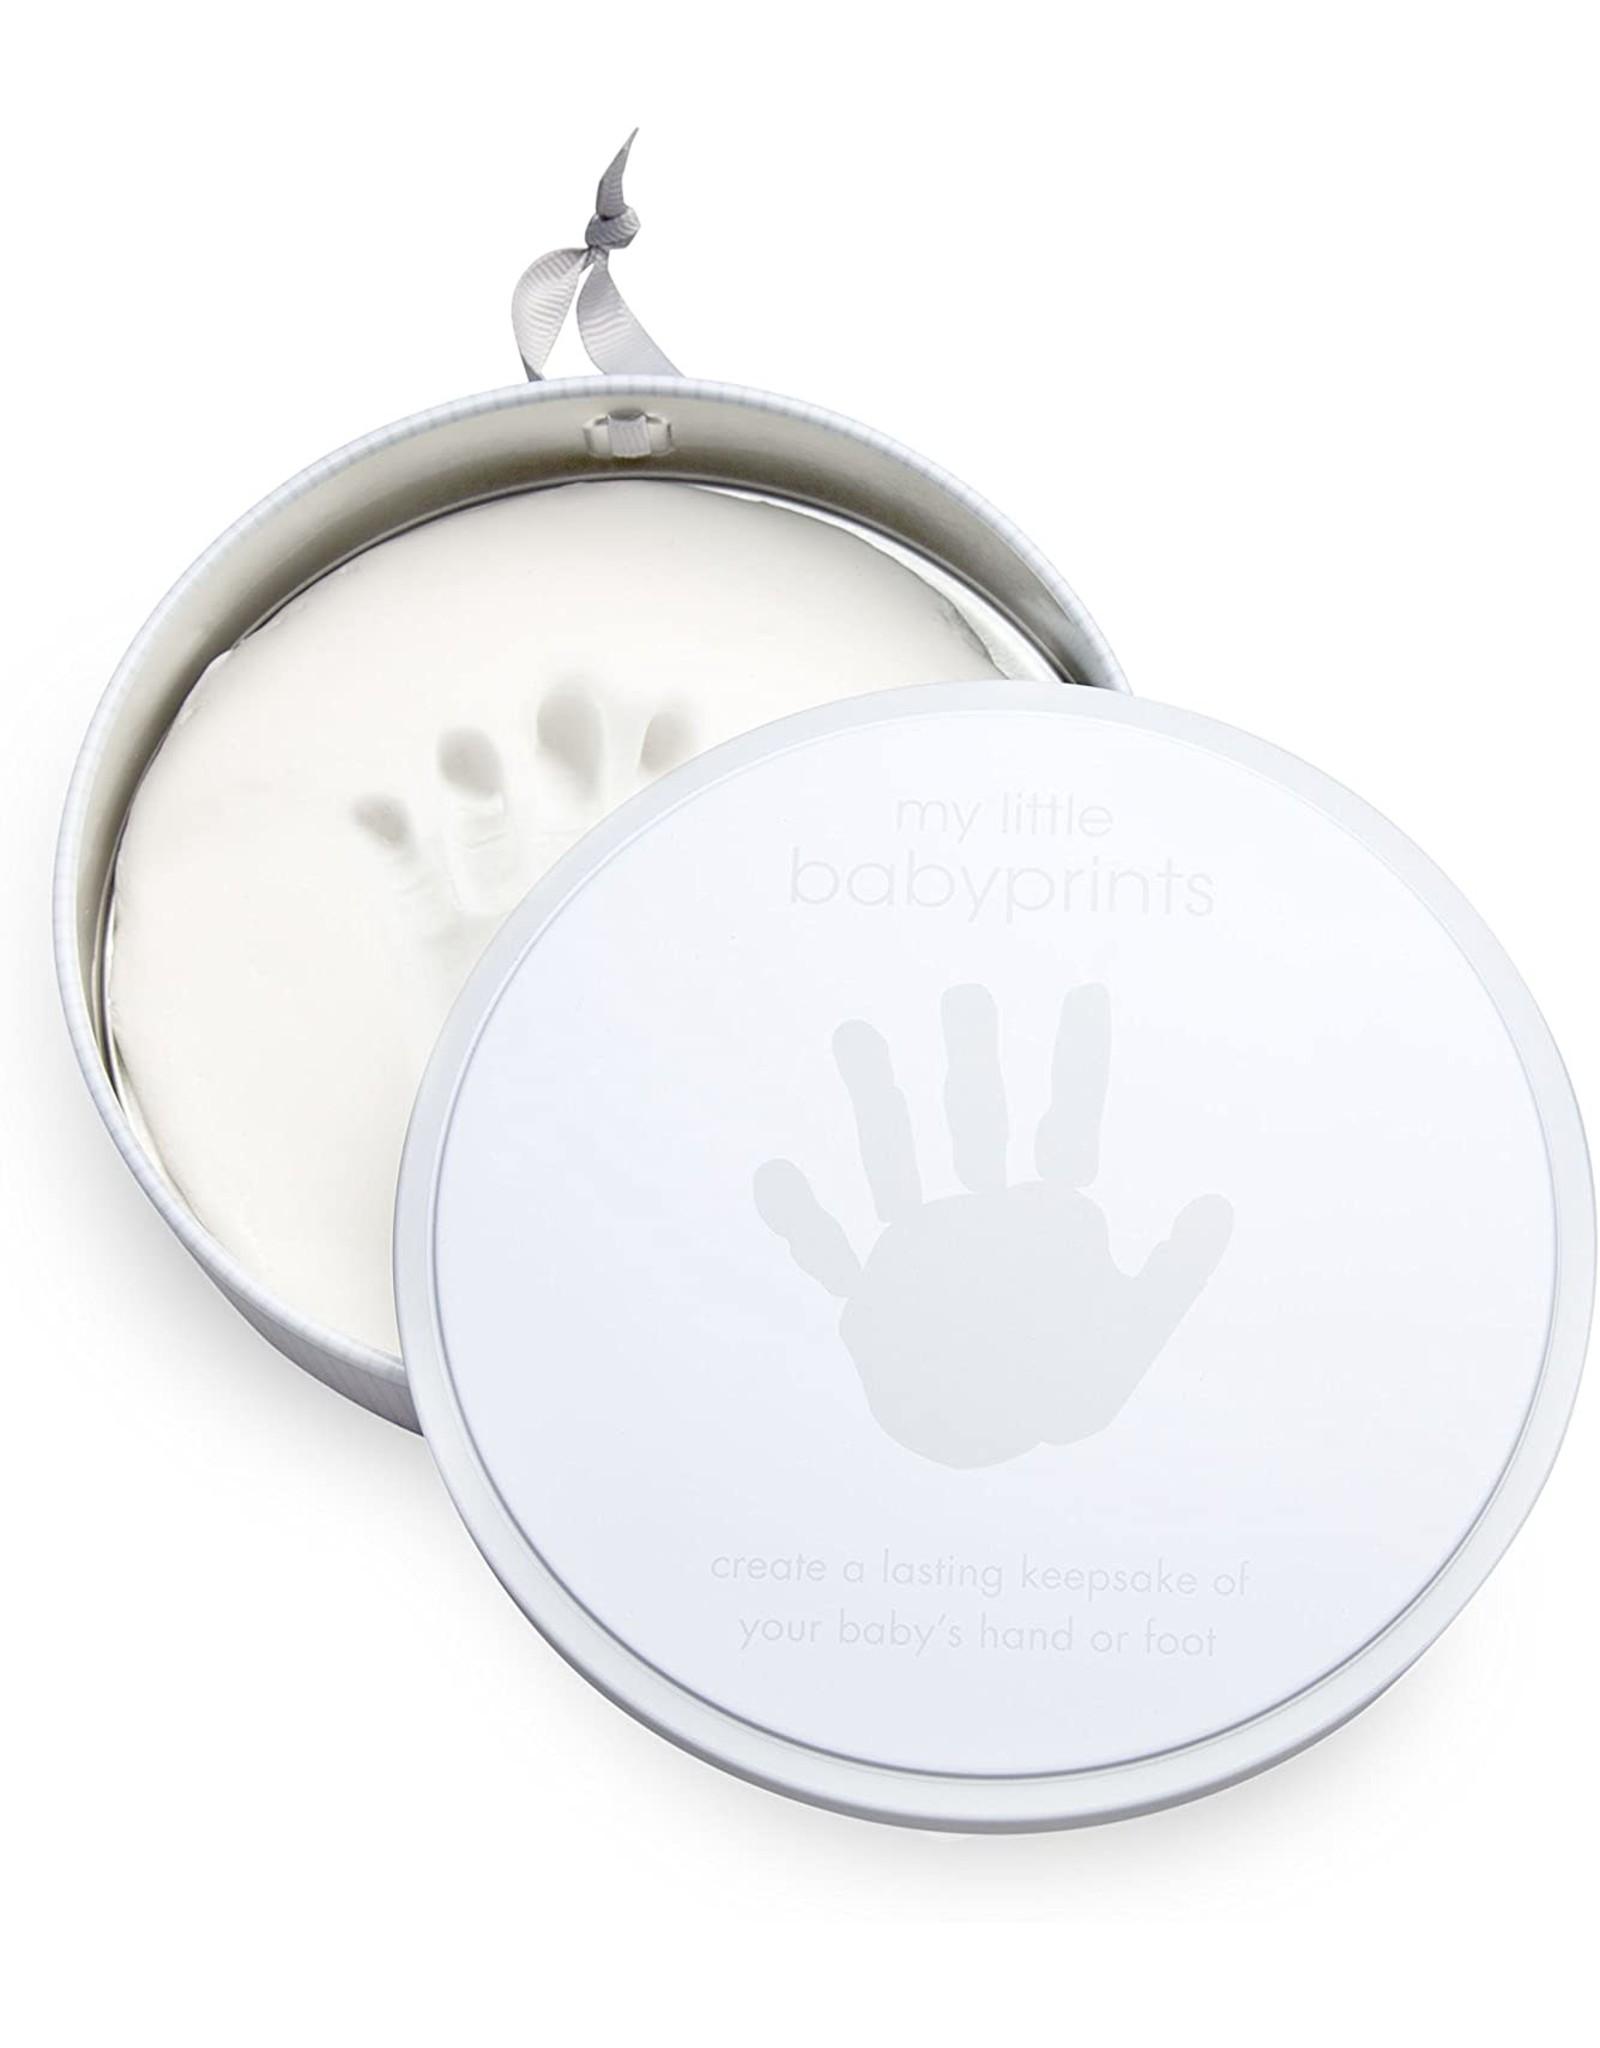 Pearhead Babyprints Tins, Grey